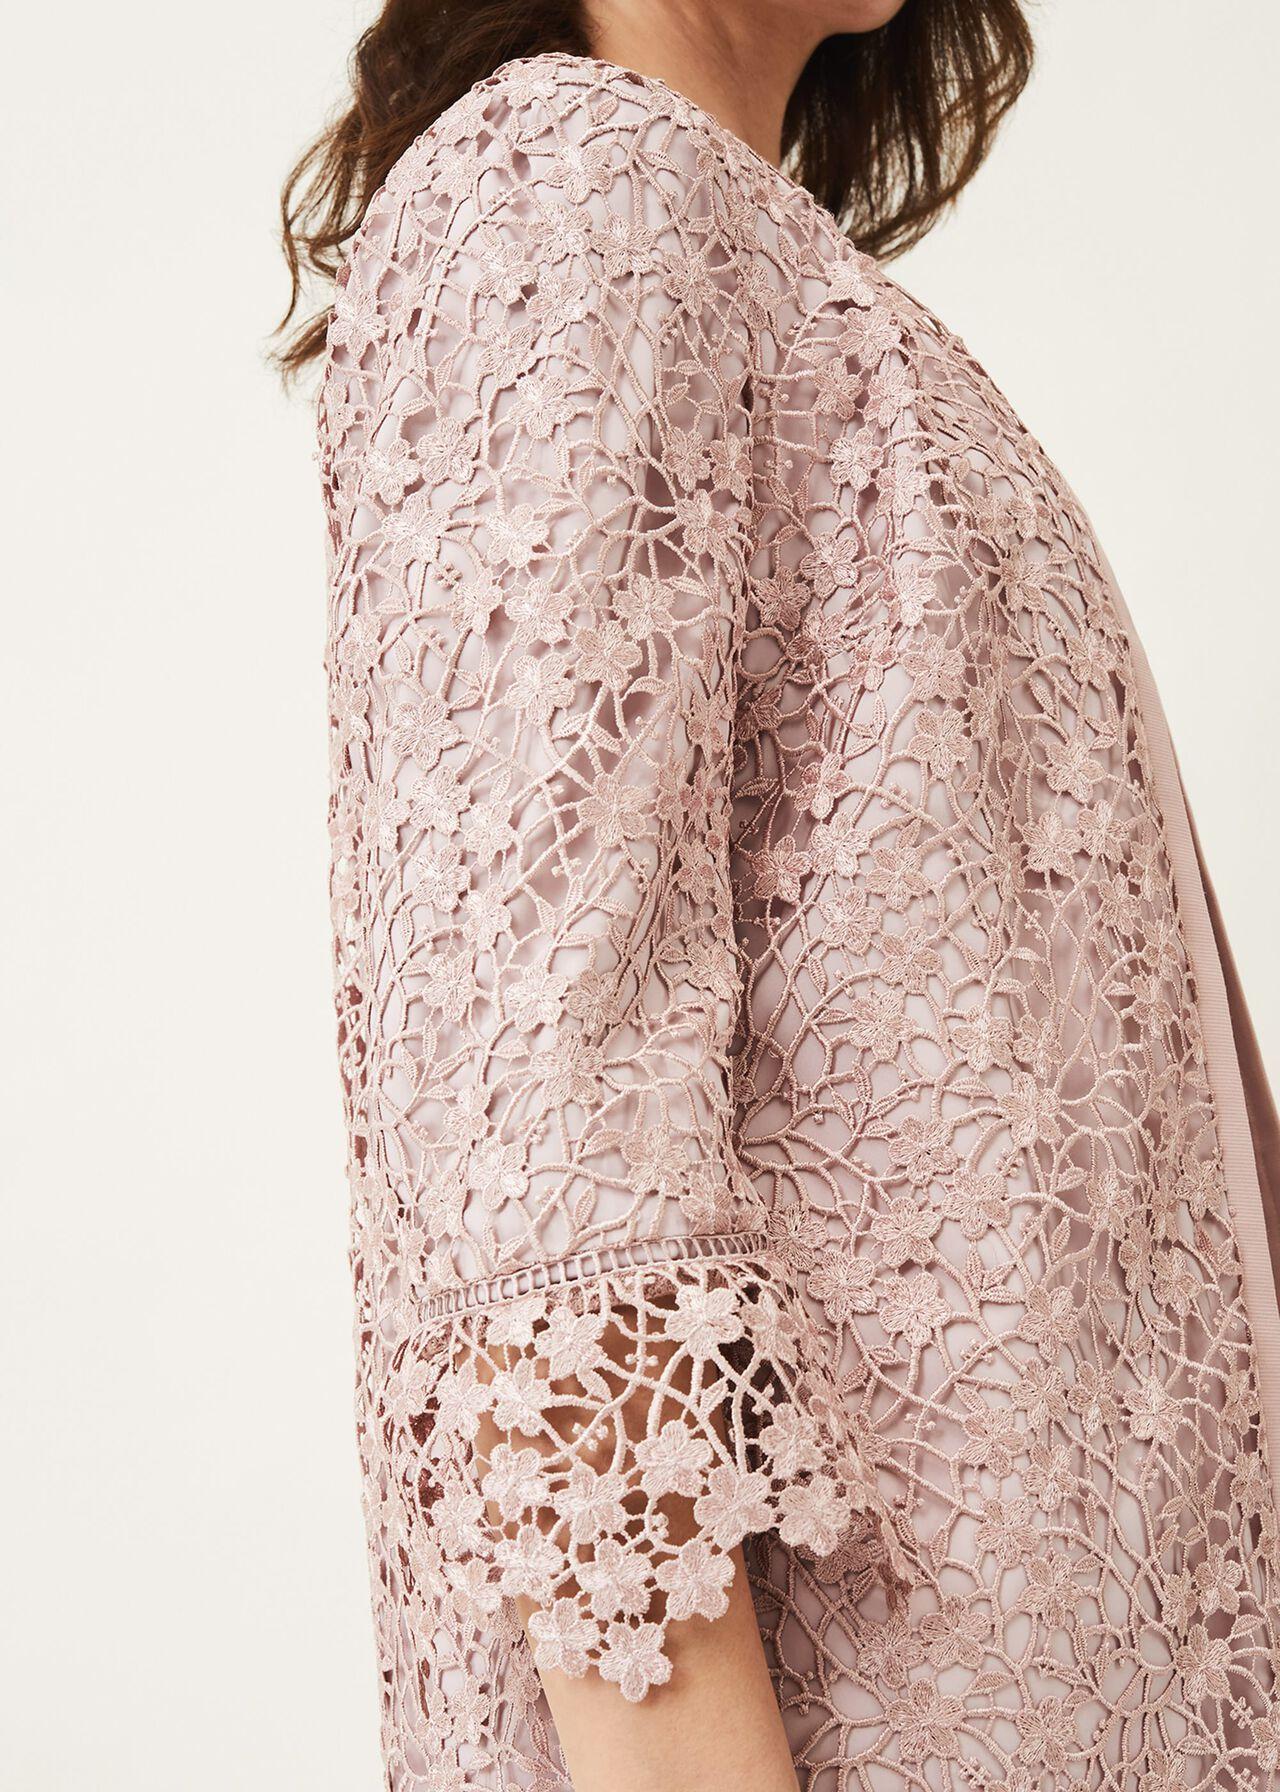 Mariposa Lace Occasion Coat